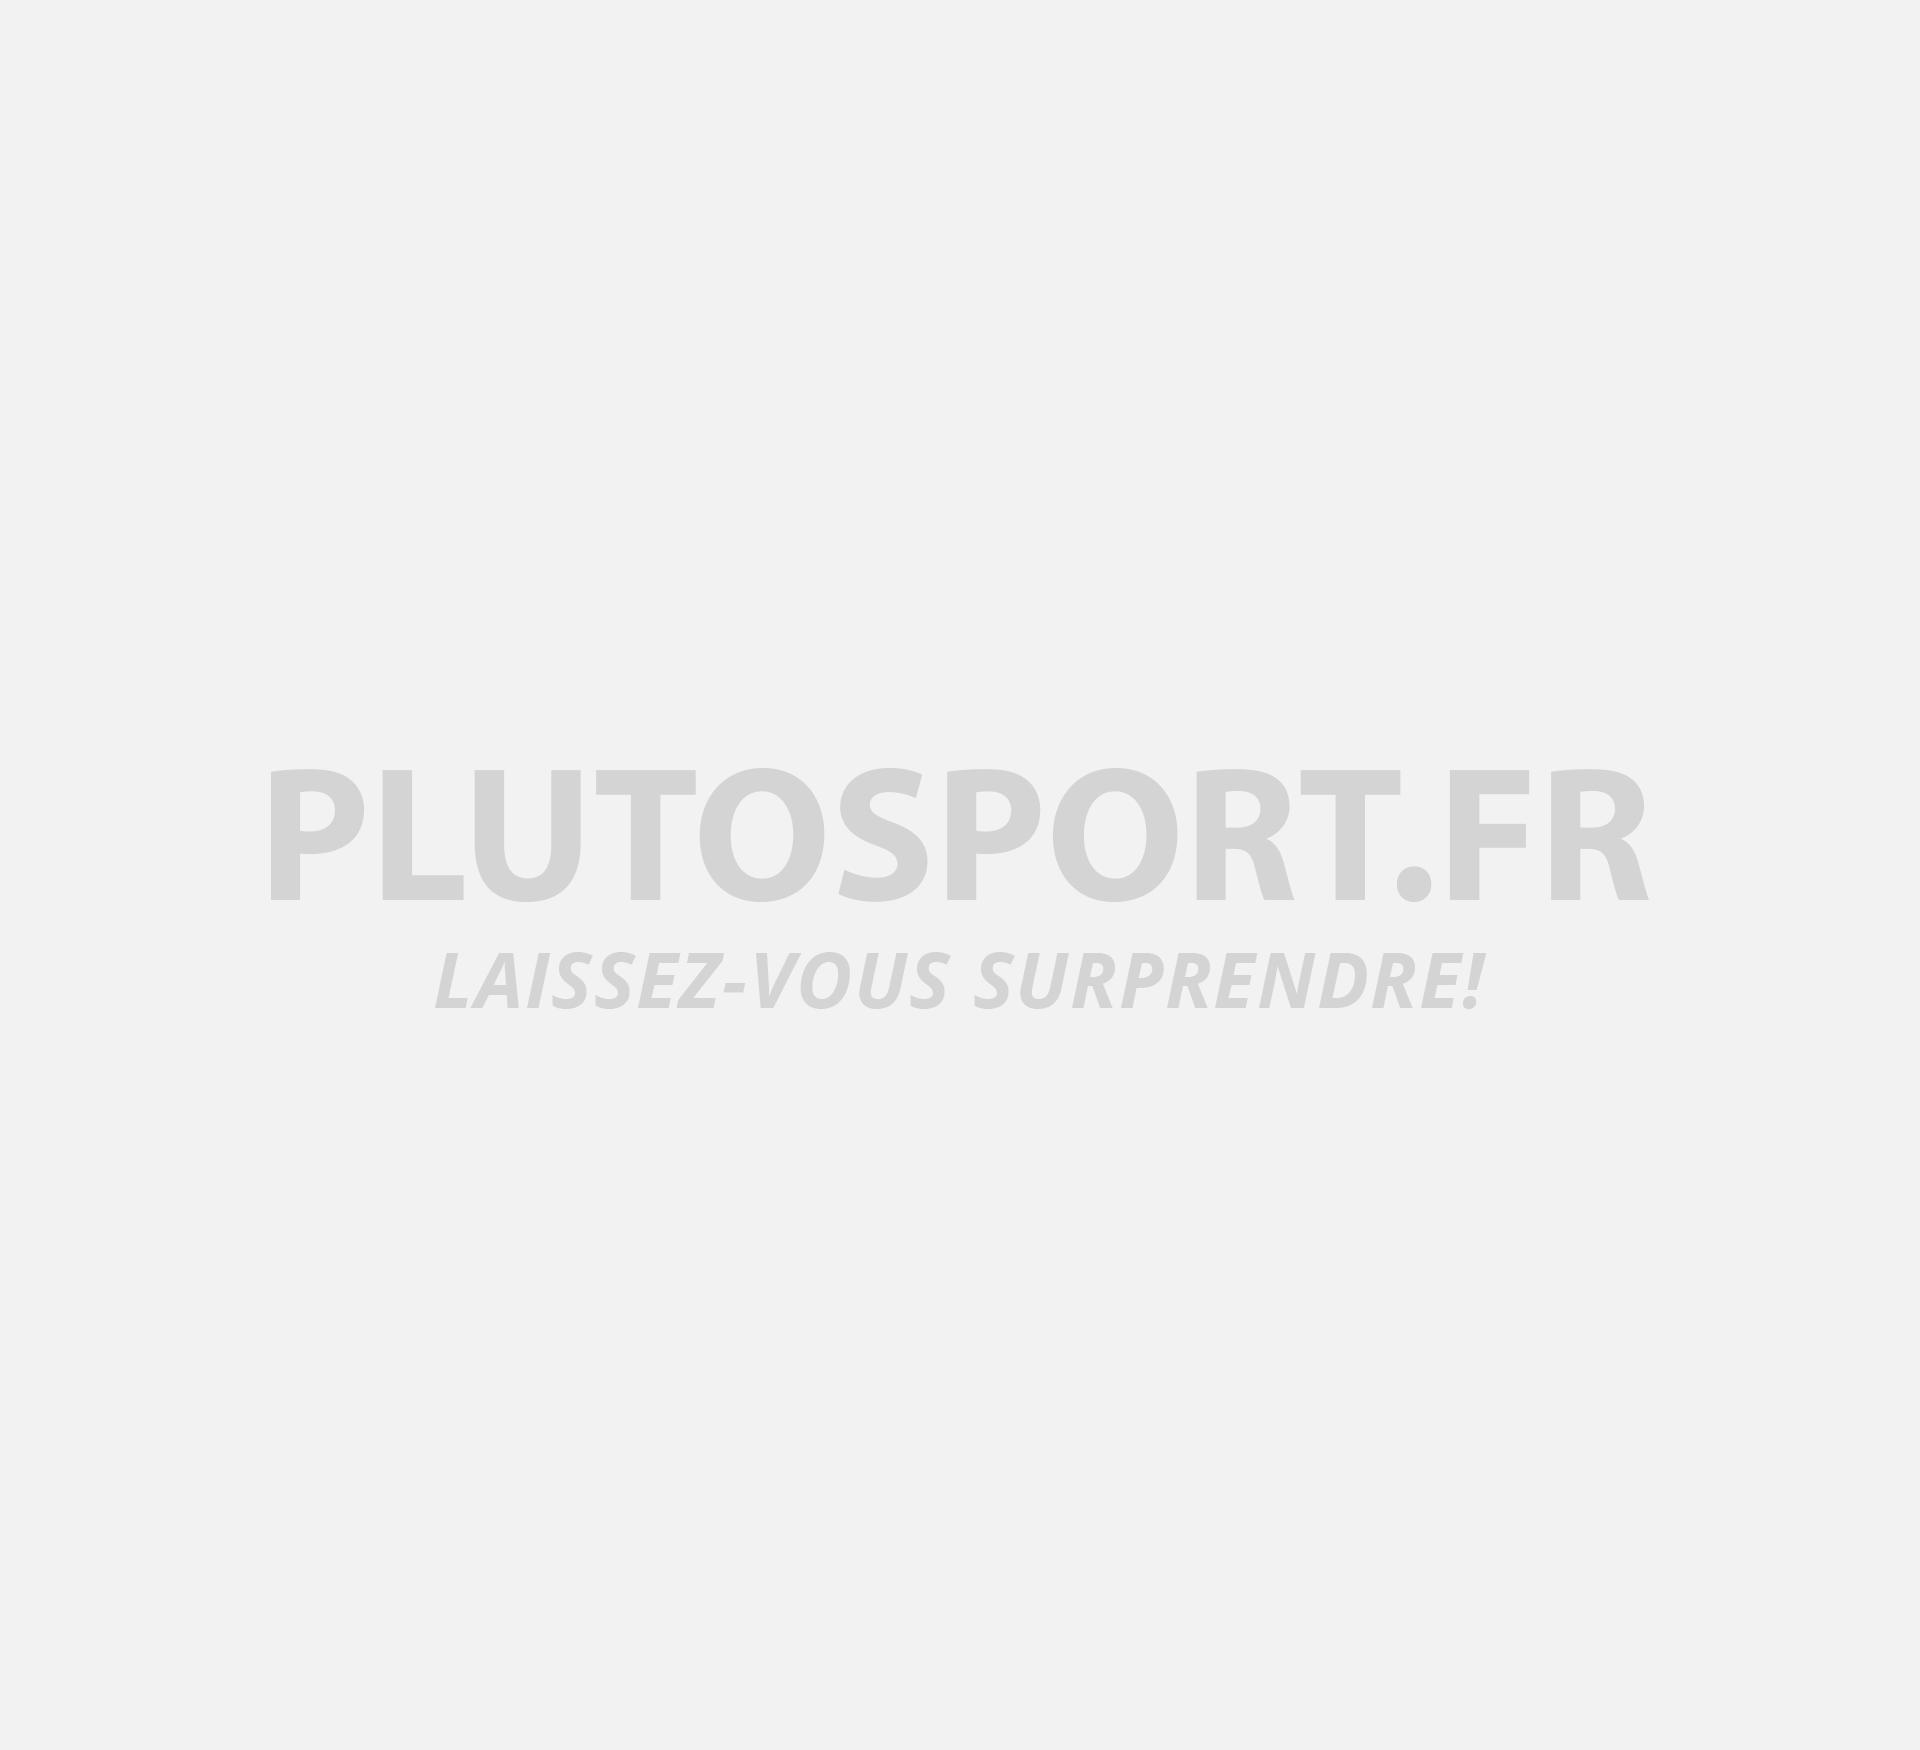 Chemise de surf  pour hommes Gul Xola Longsleeve Rashguard